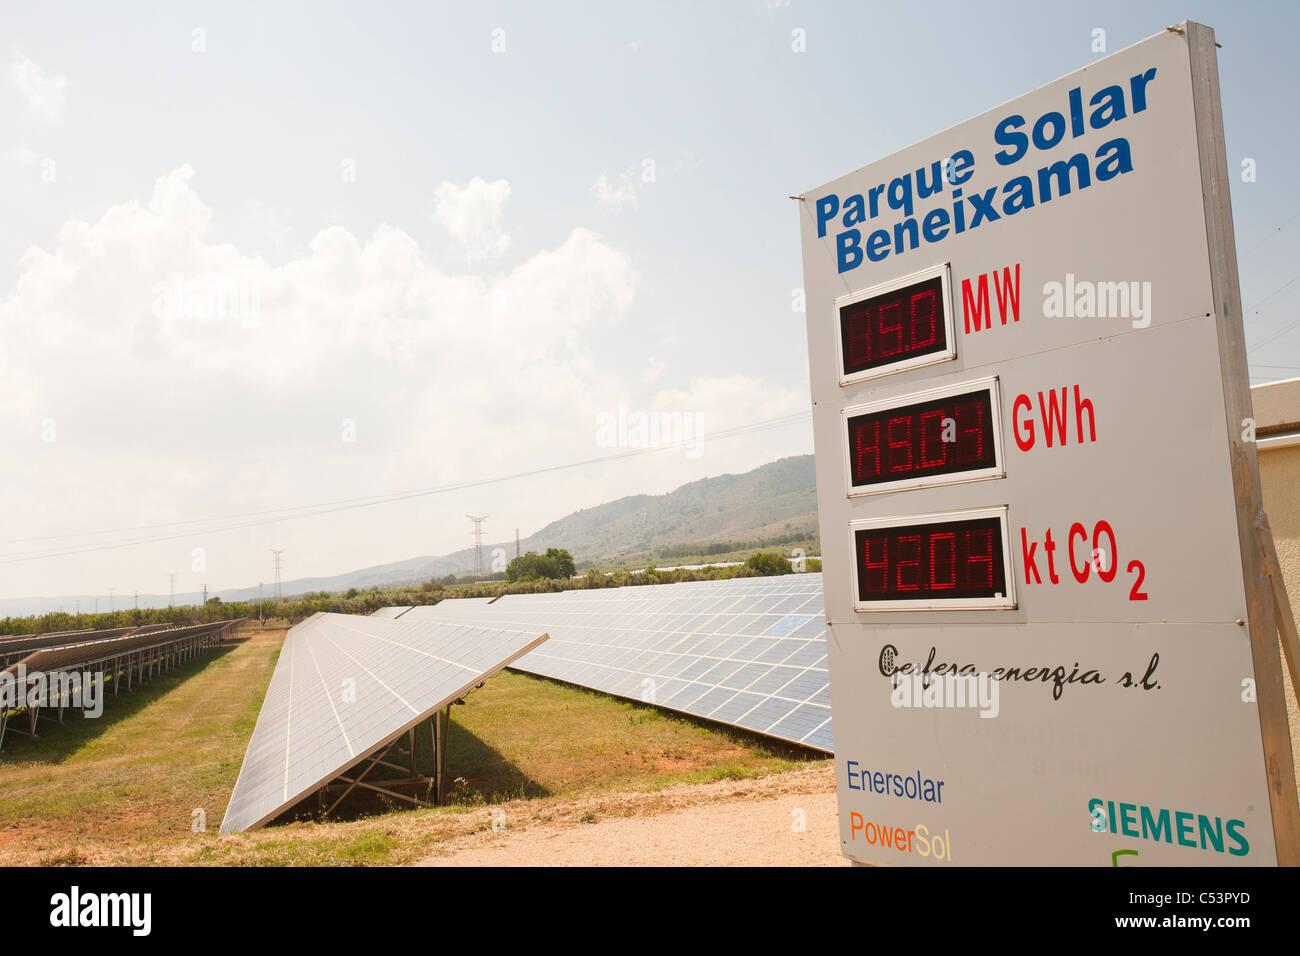 Photovoltaik-Module in Beneixama Solarkraftwerk, Beneixama, Mercia, Spanien. Stockbild